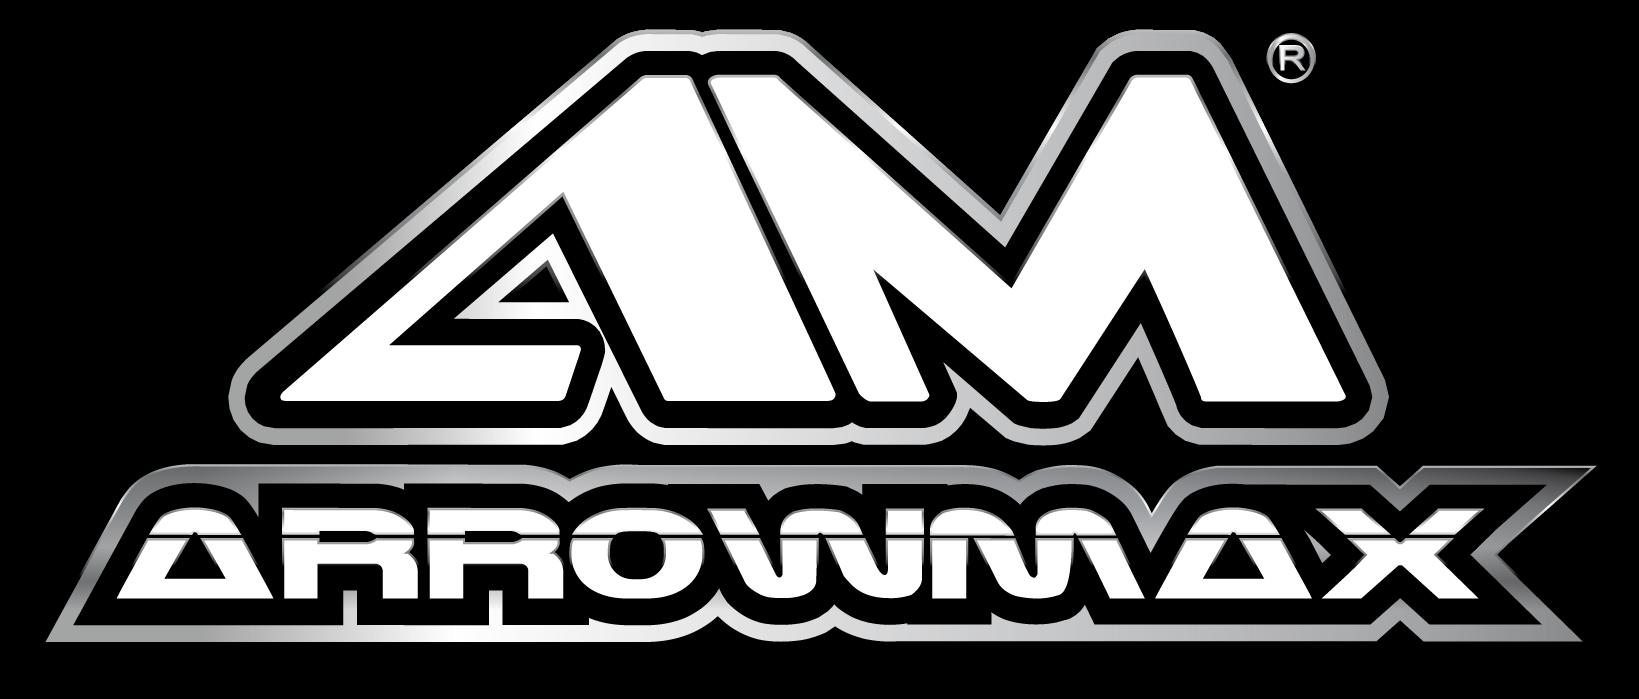 Arrowmax84